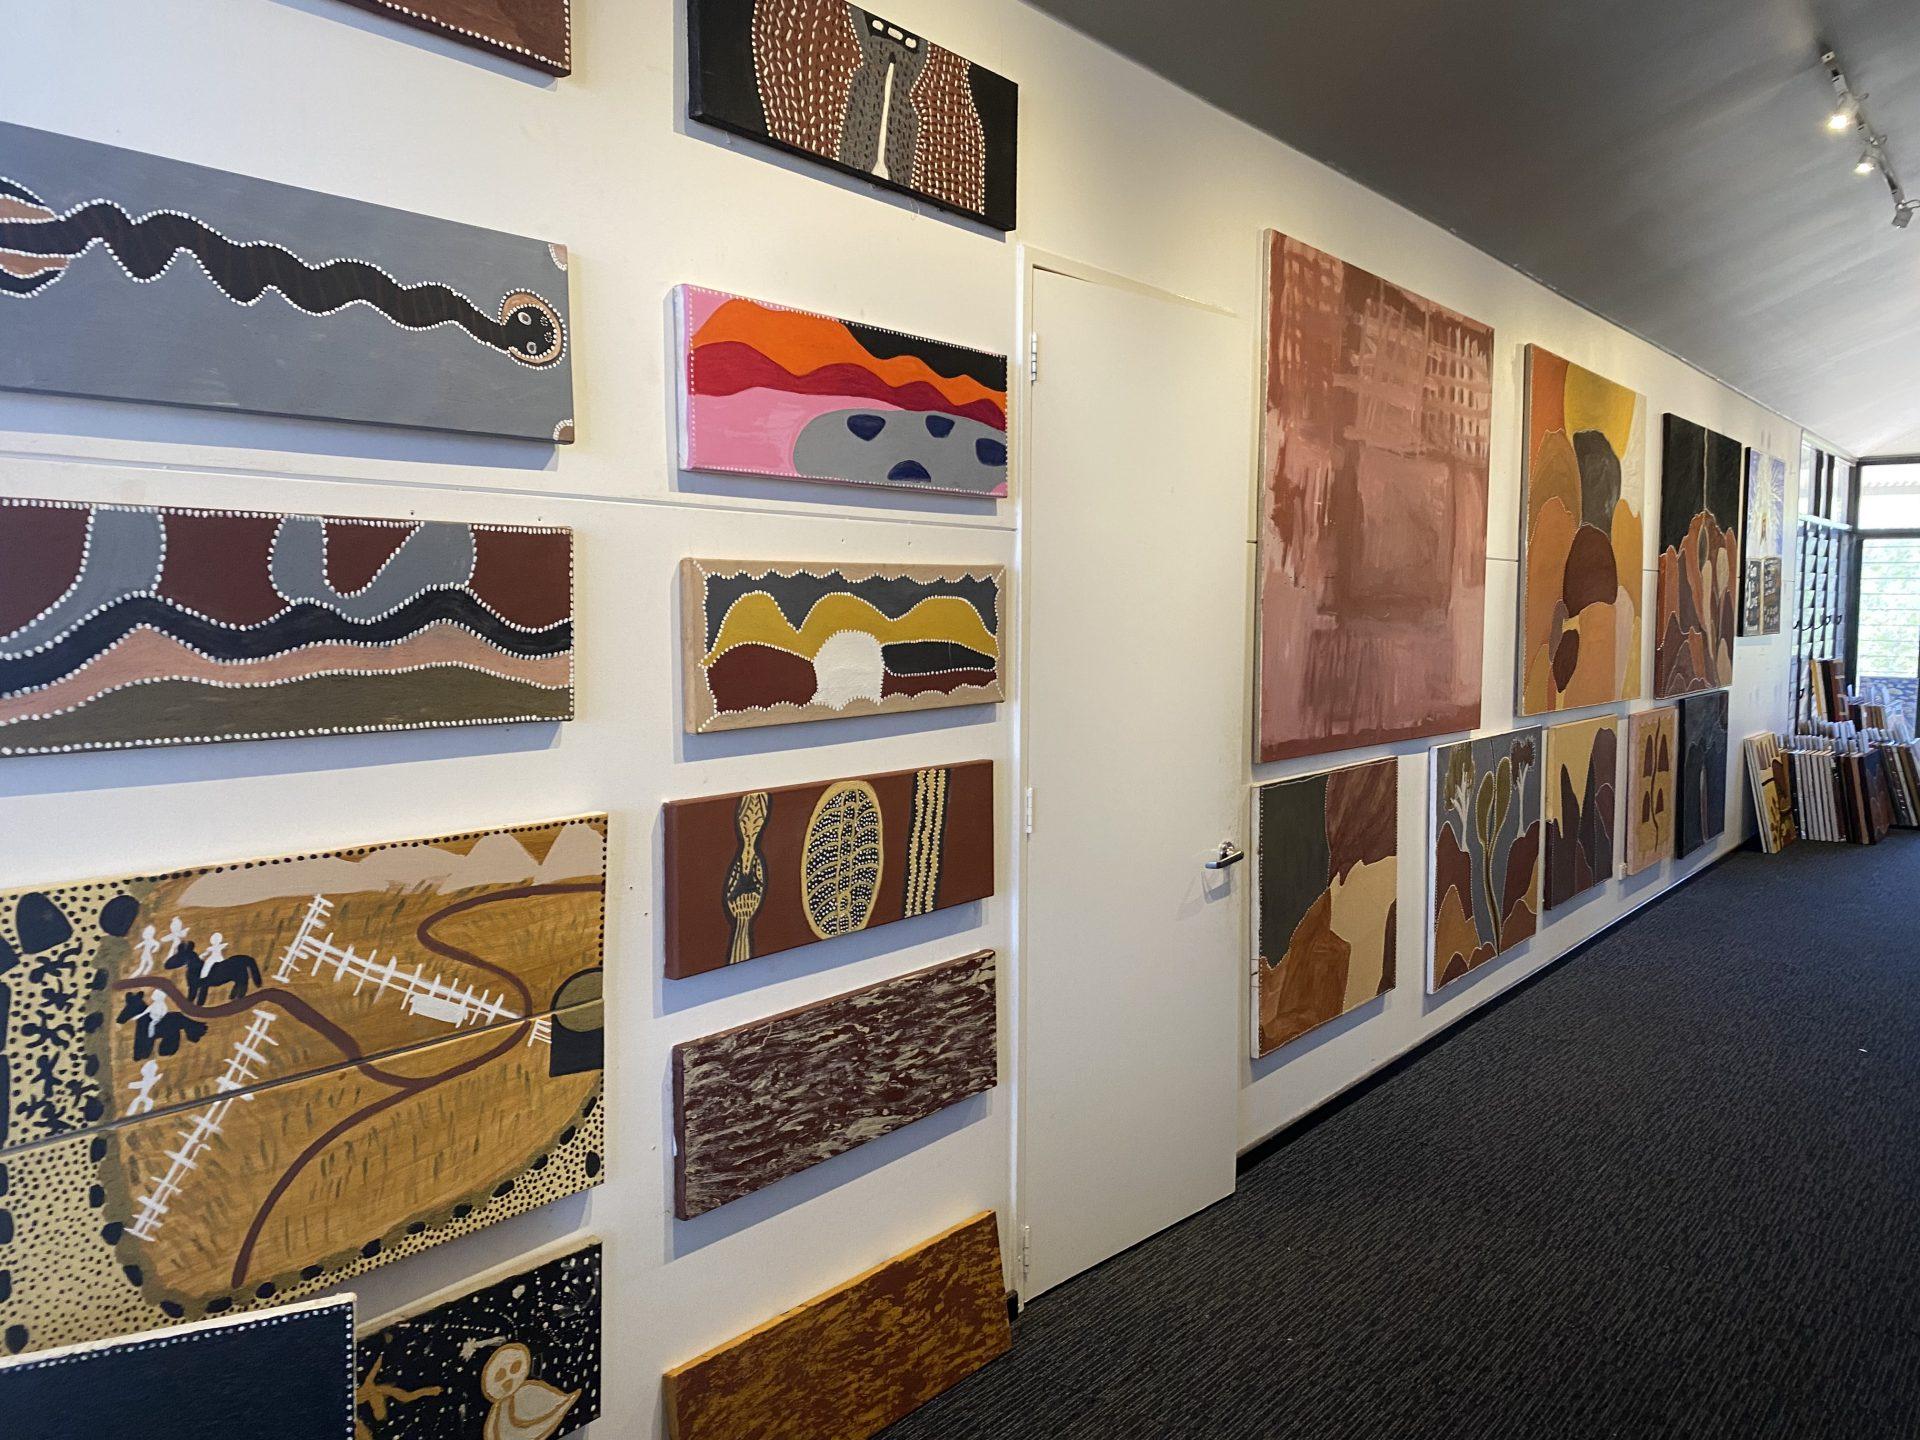 Artworks installed at Warmun Art Centre. Image courtesy Chad Creighton.